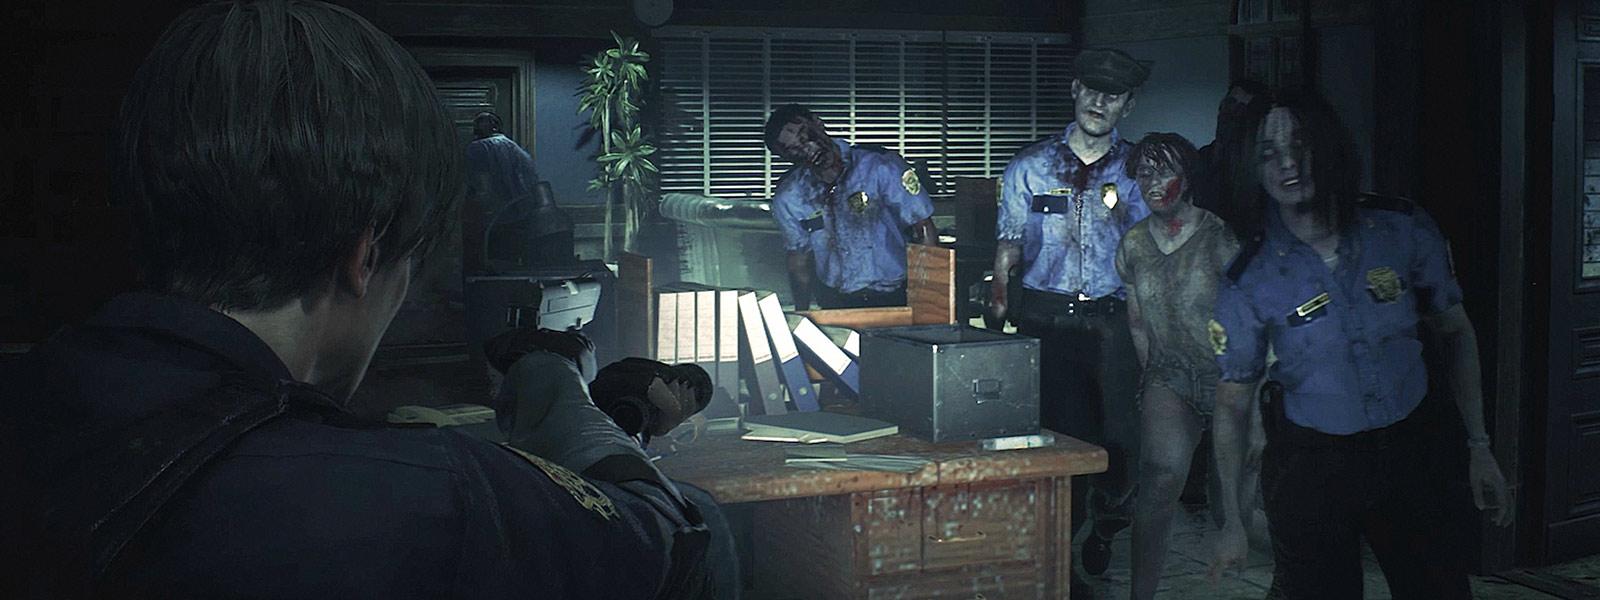 Skupina zombií ide smerom k Leonovi Kennedyovi na policajnej stanici